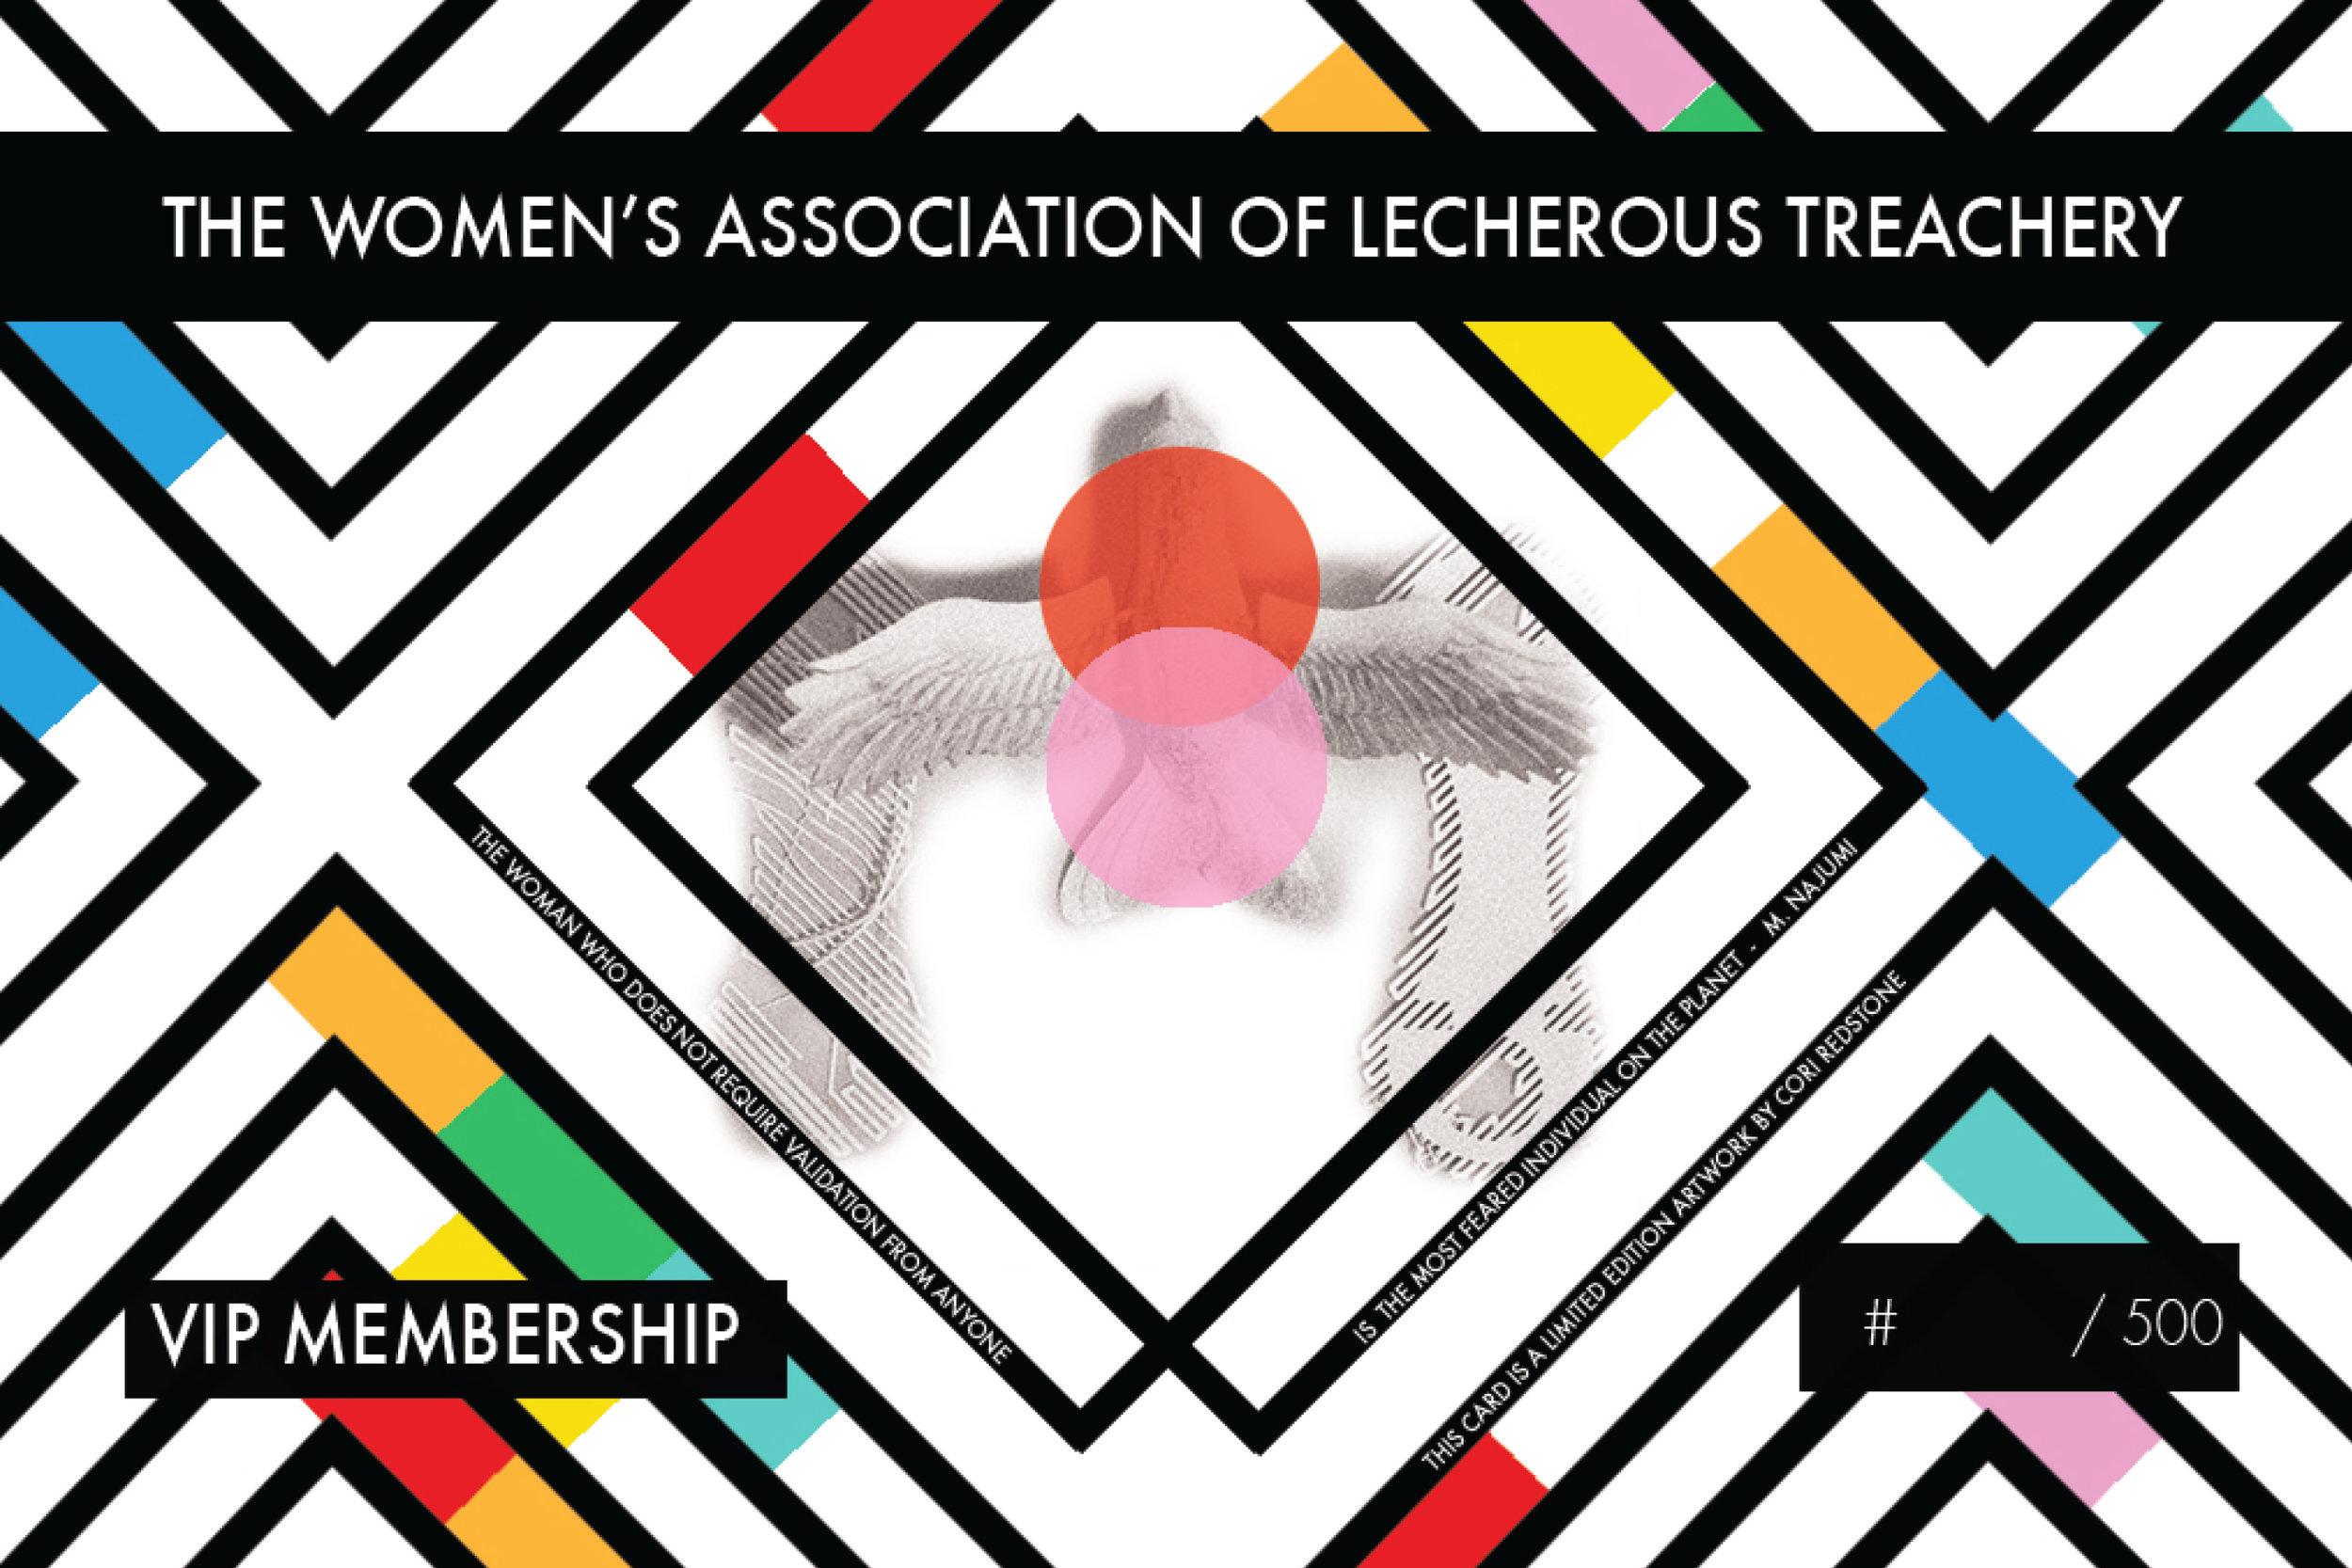 cori-redstone_membership-card_-the-womens-association-of-lecherous-treachury.jpg